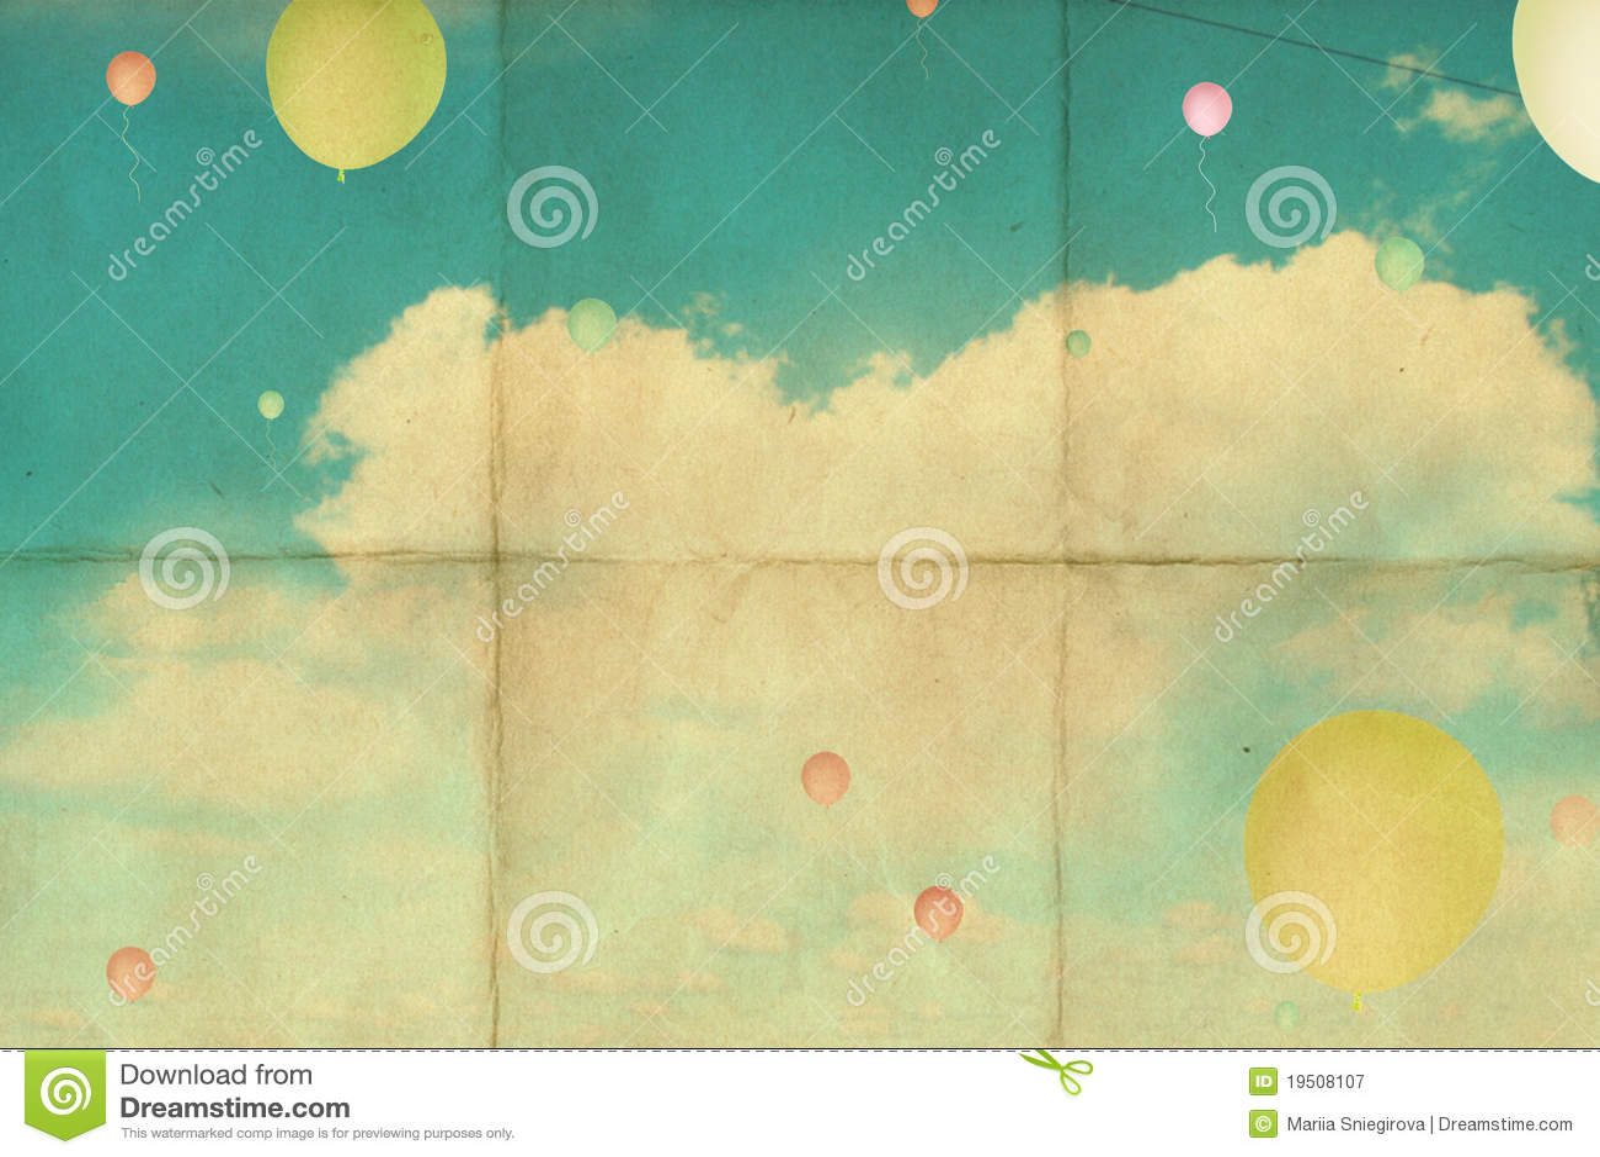 Retro background with sky